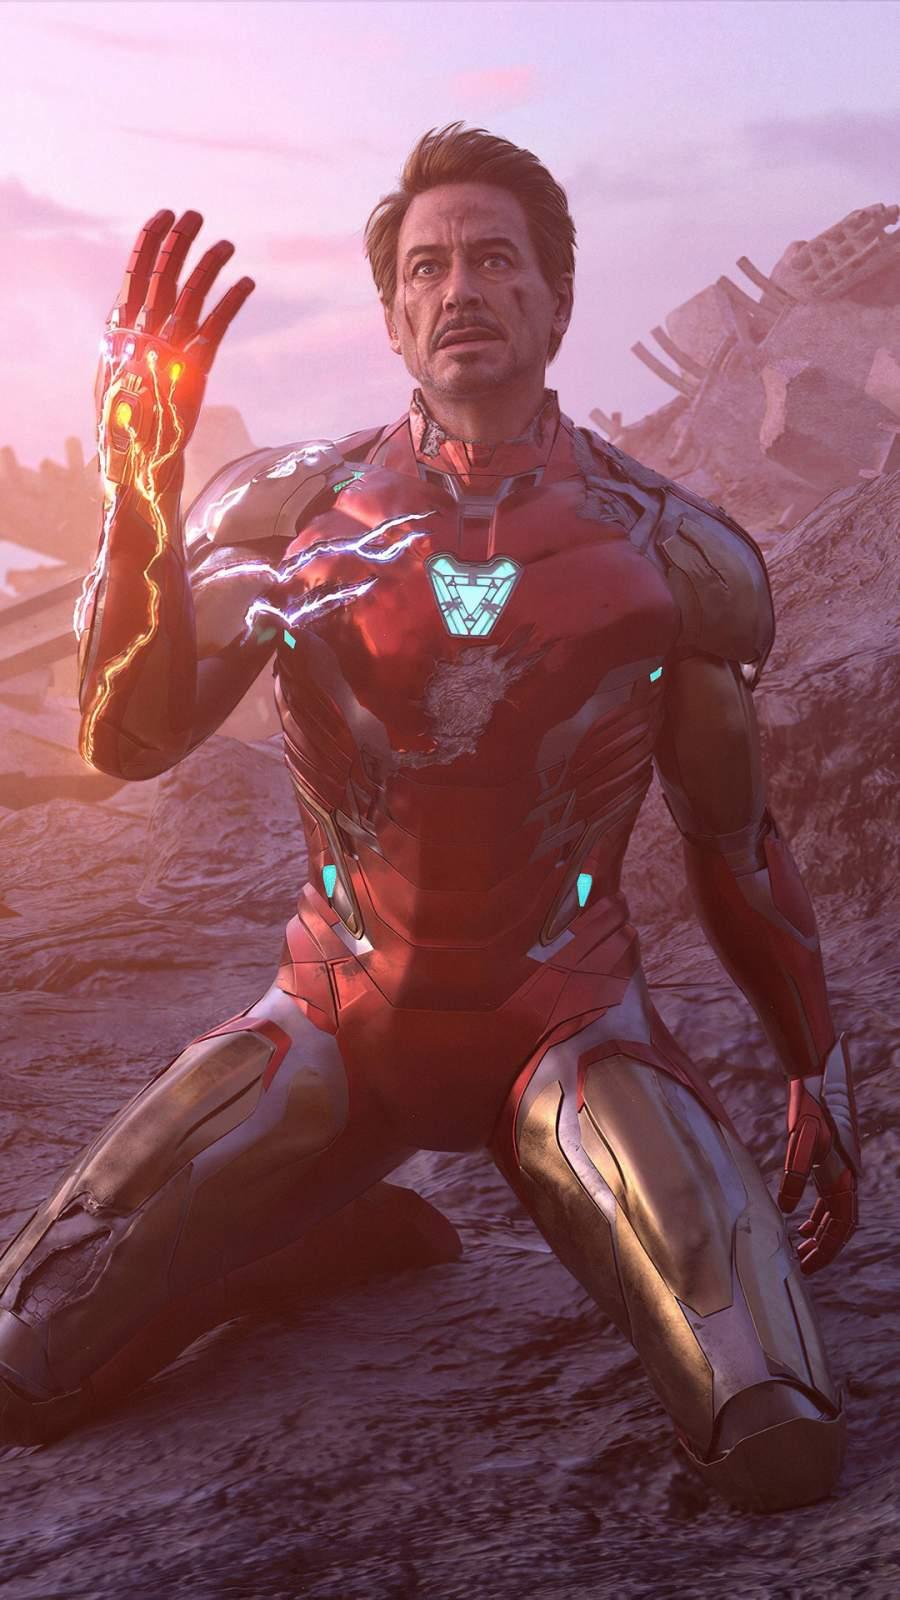 Iron Man Sacrifice iPhone Wallpaper